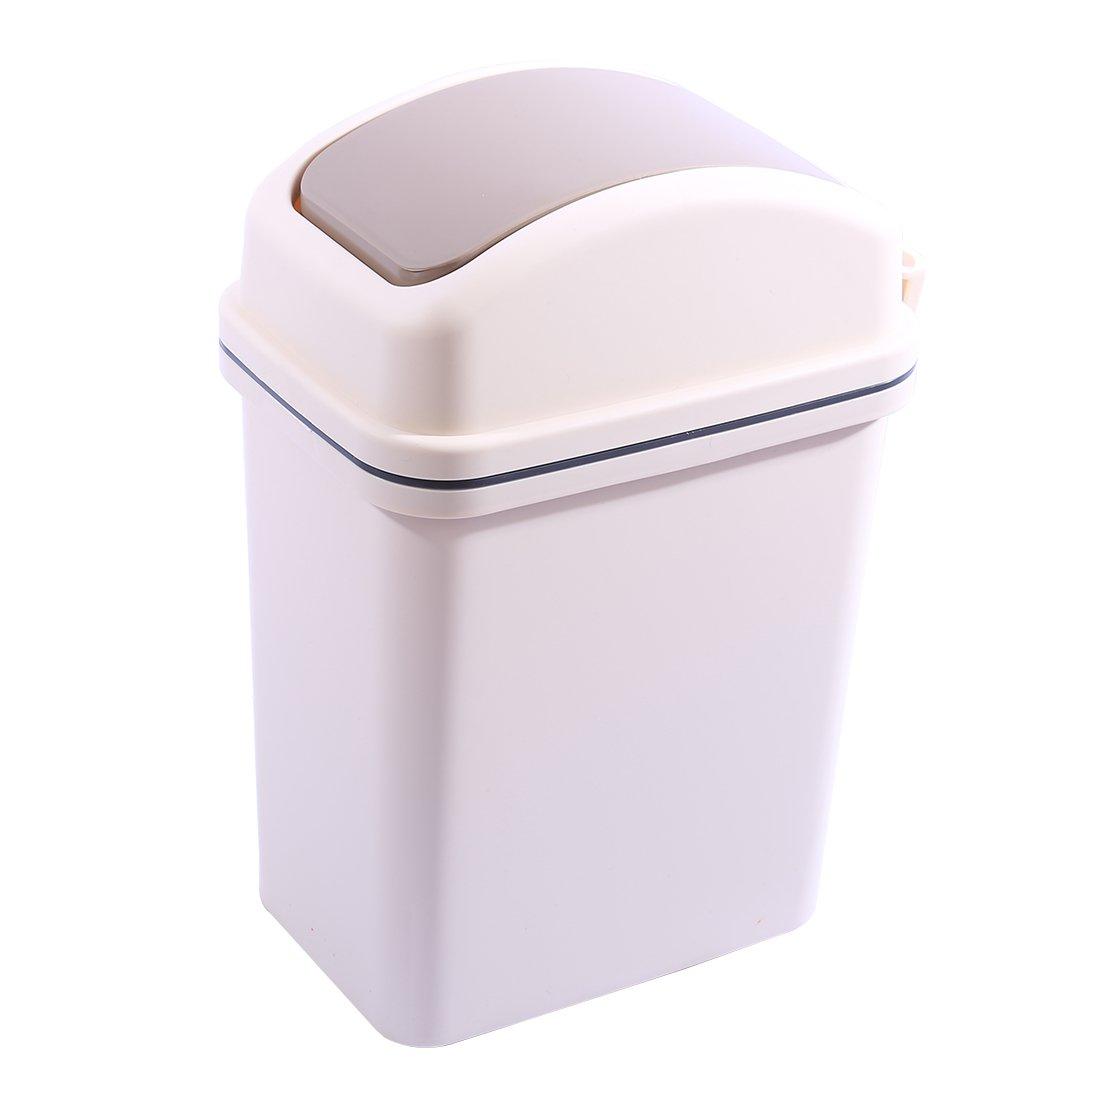 Flip Trash Can, WOLFBUSH 6 Liter Plastic Waste Bin with Swiveling Lid Bathroom Kitchen Office Garbage Litter Bin, Rectangular